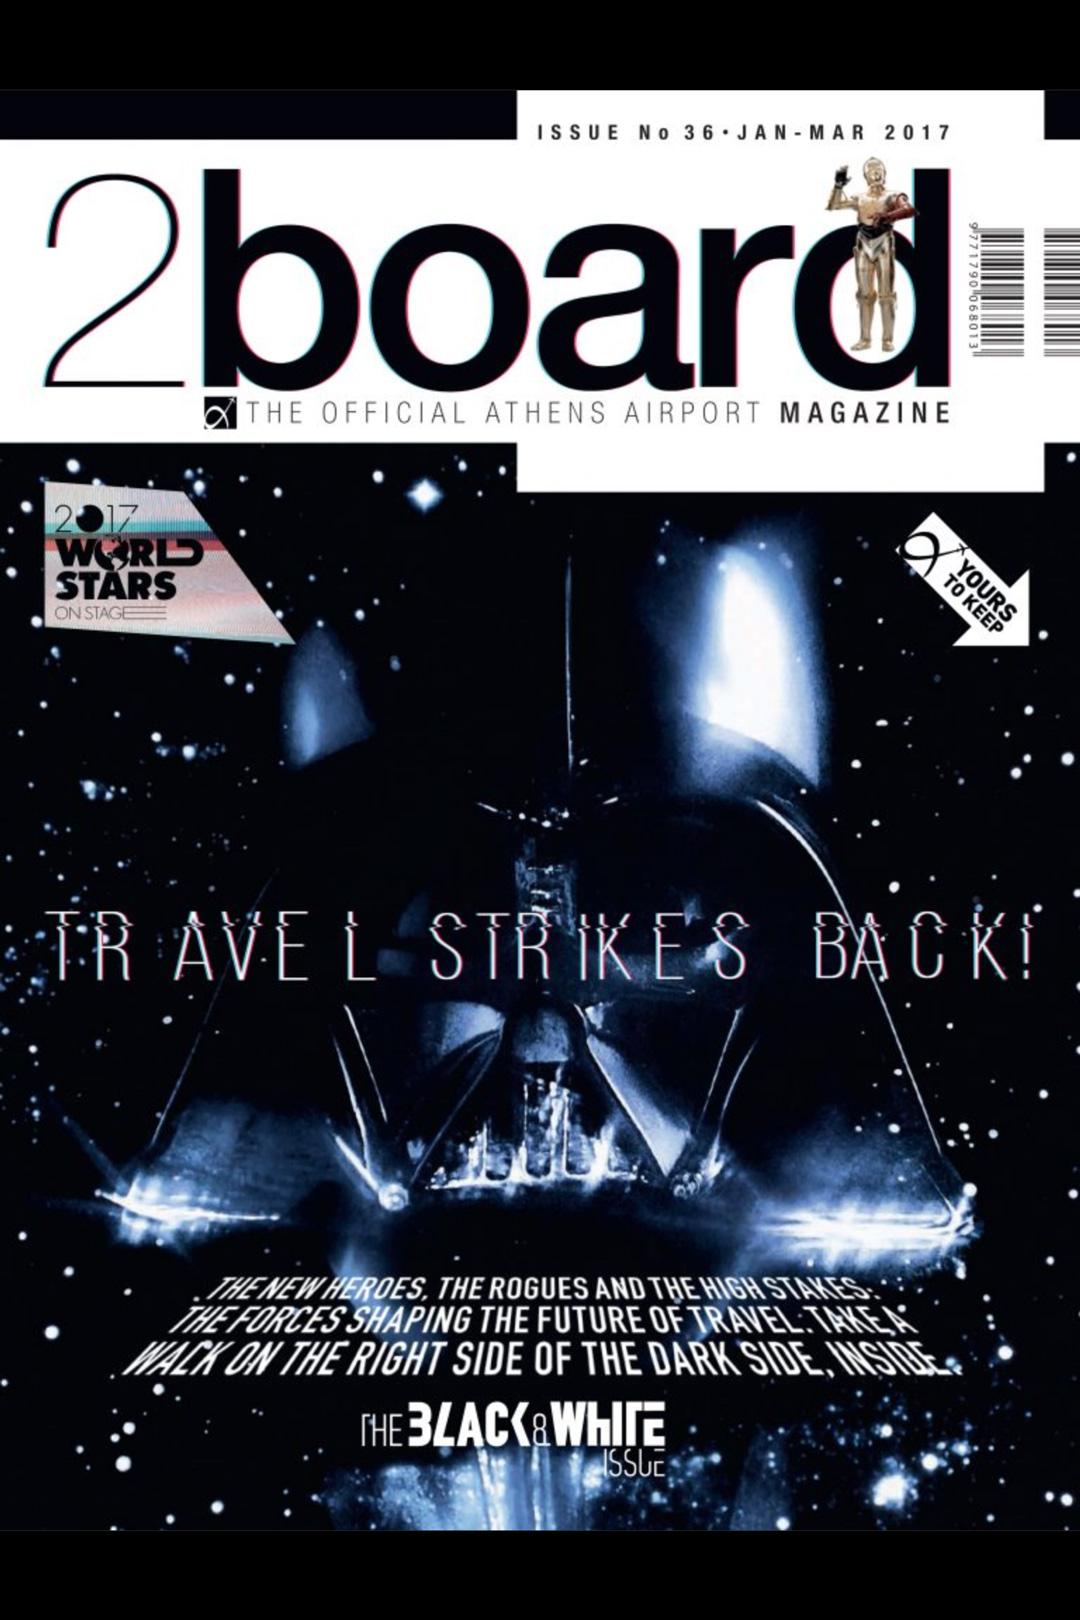 2Board